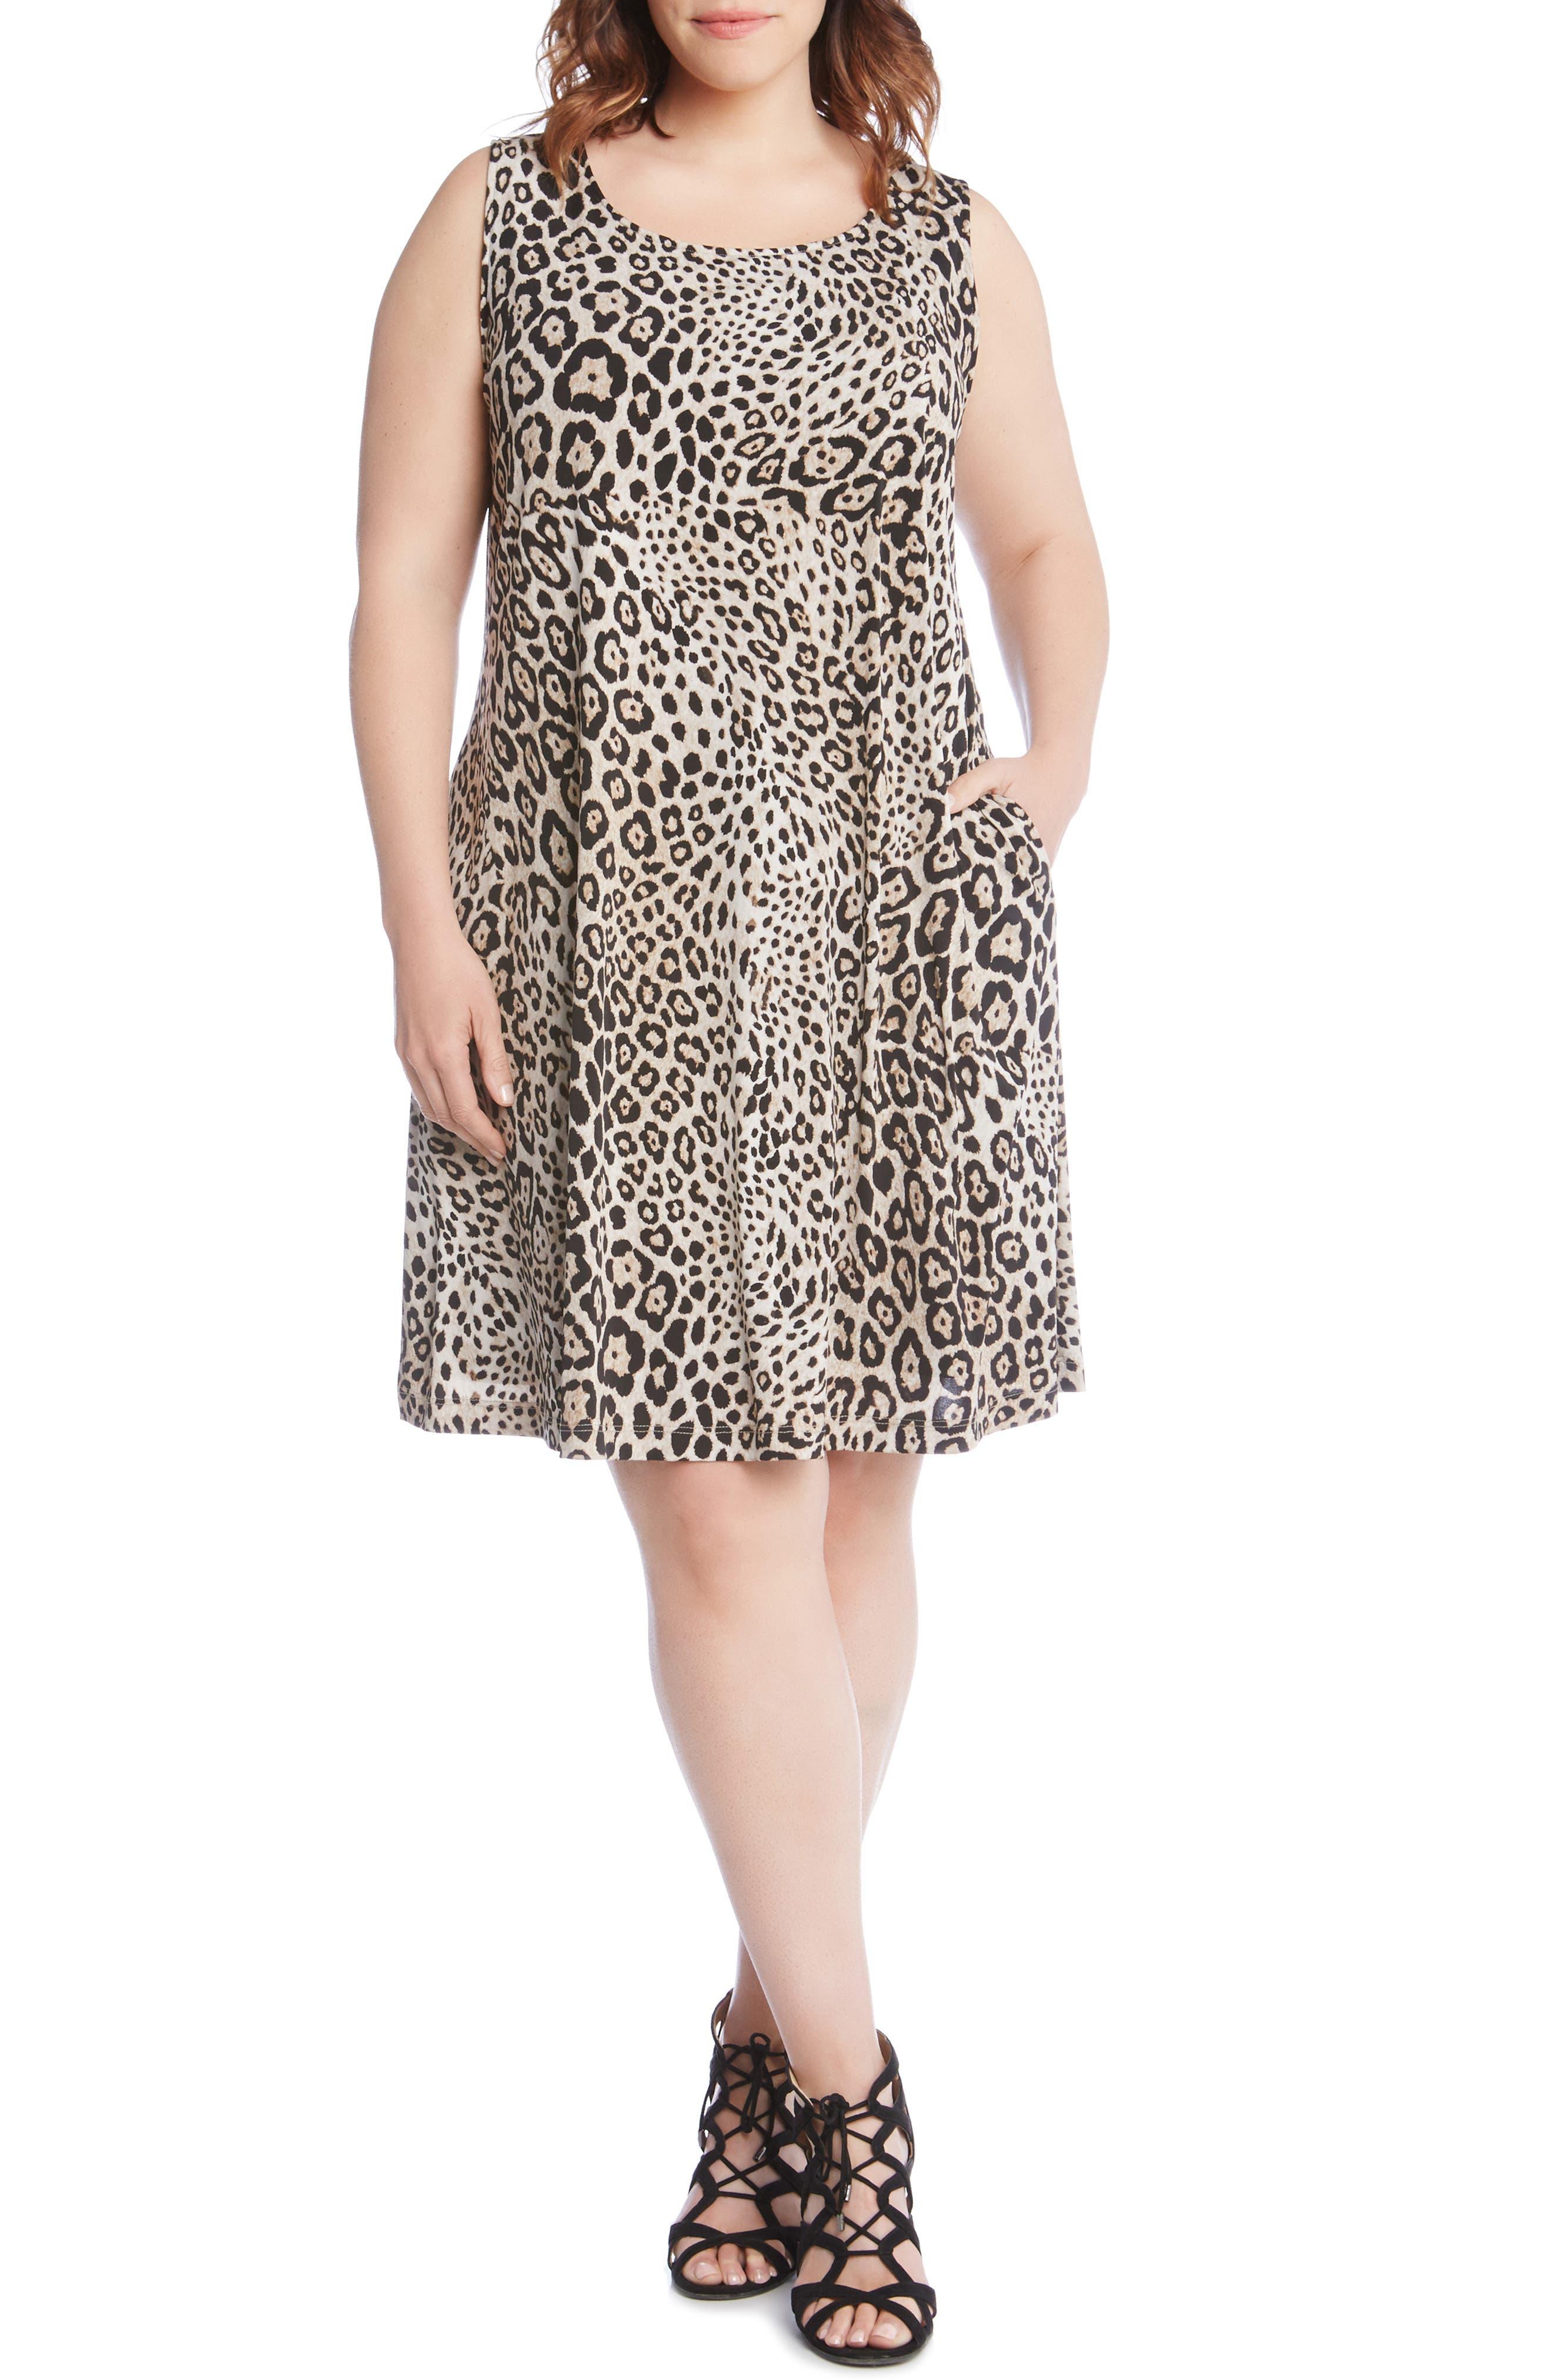 CHLOE LEOPARD PRINT A-LINE DRESS